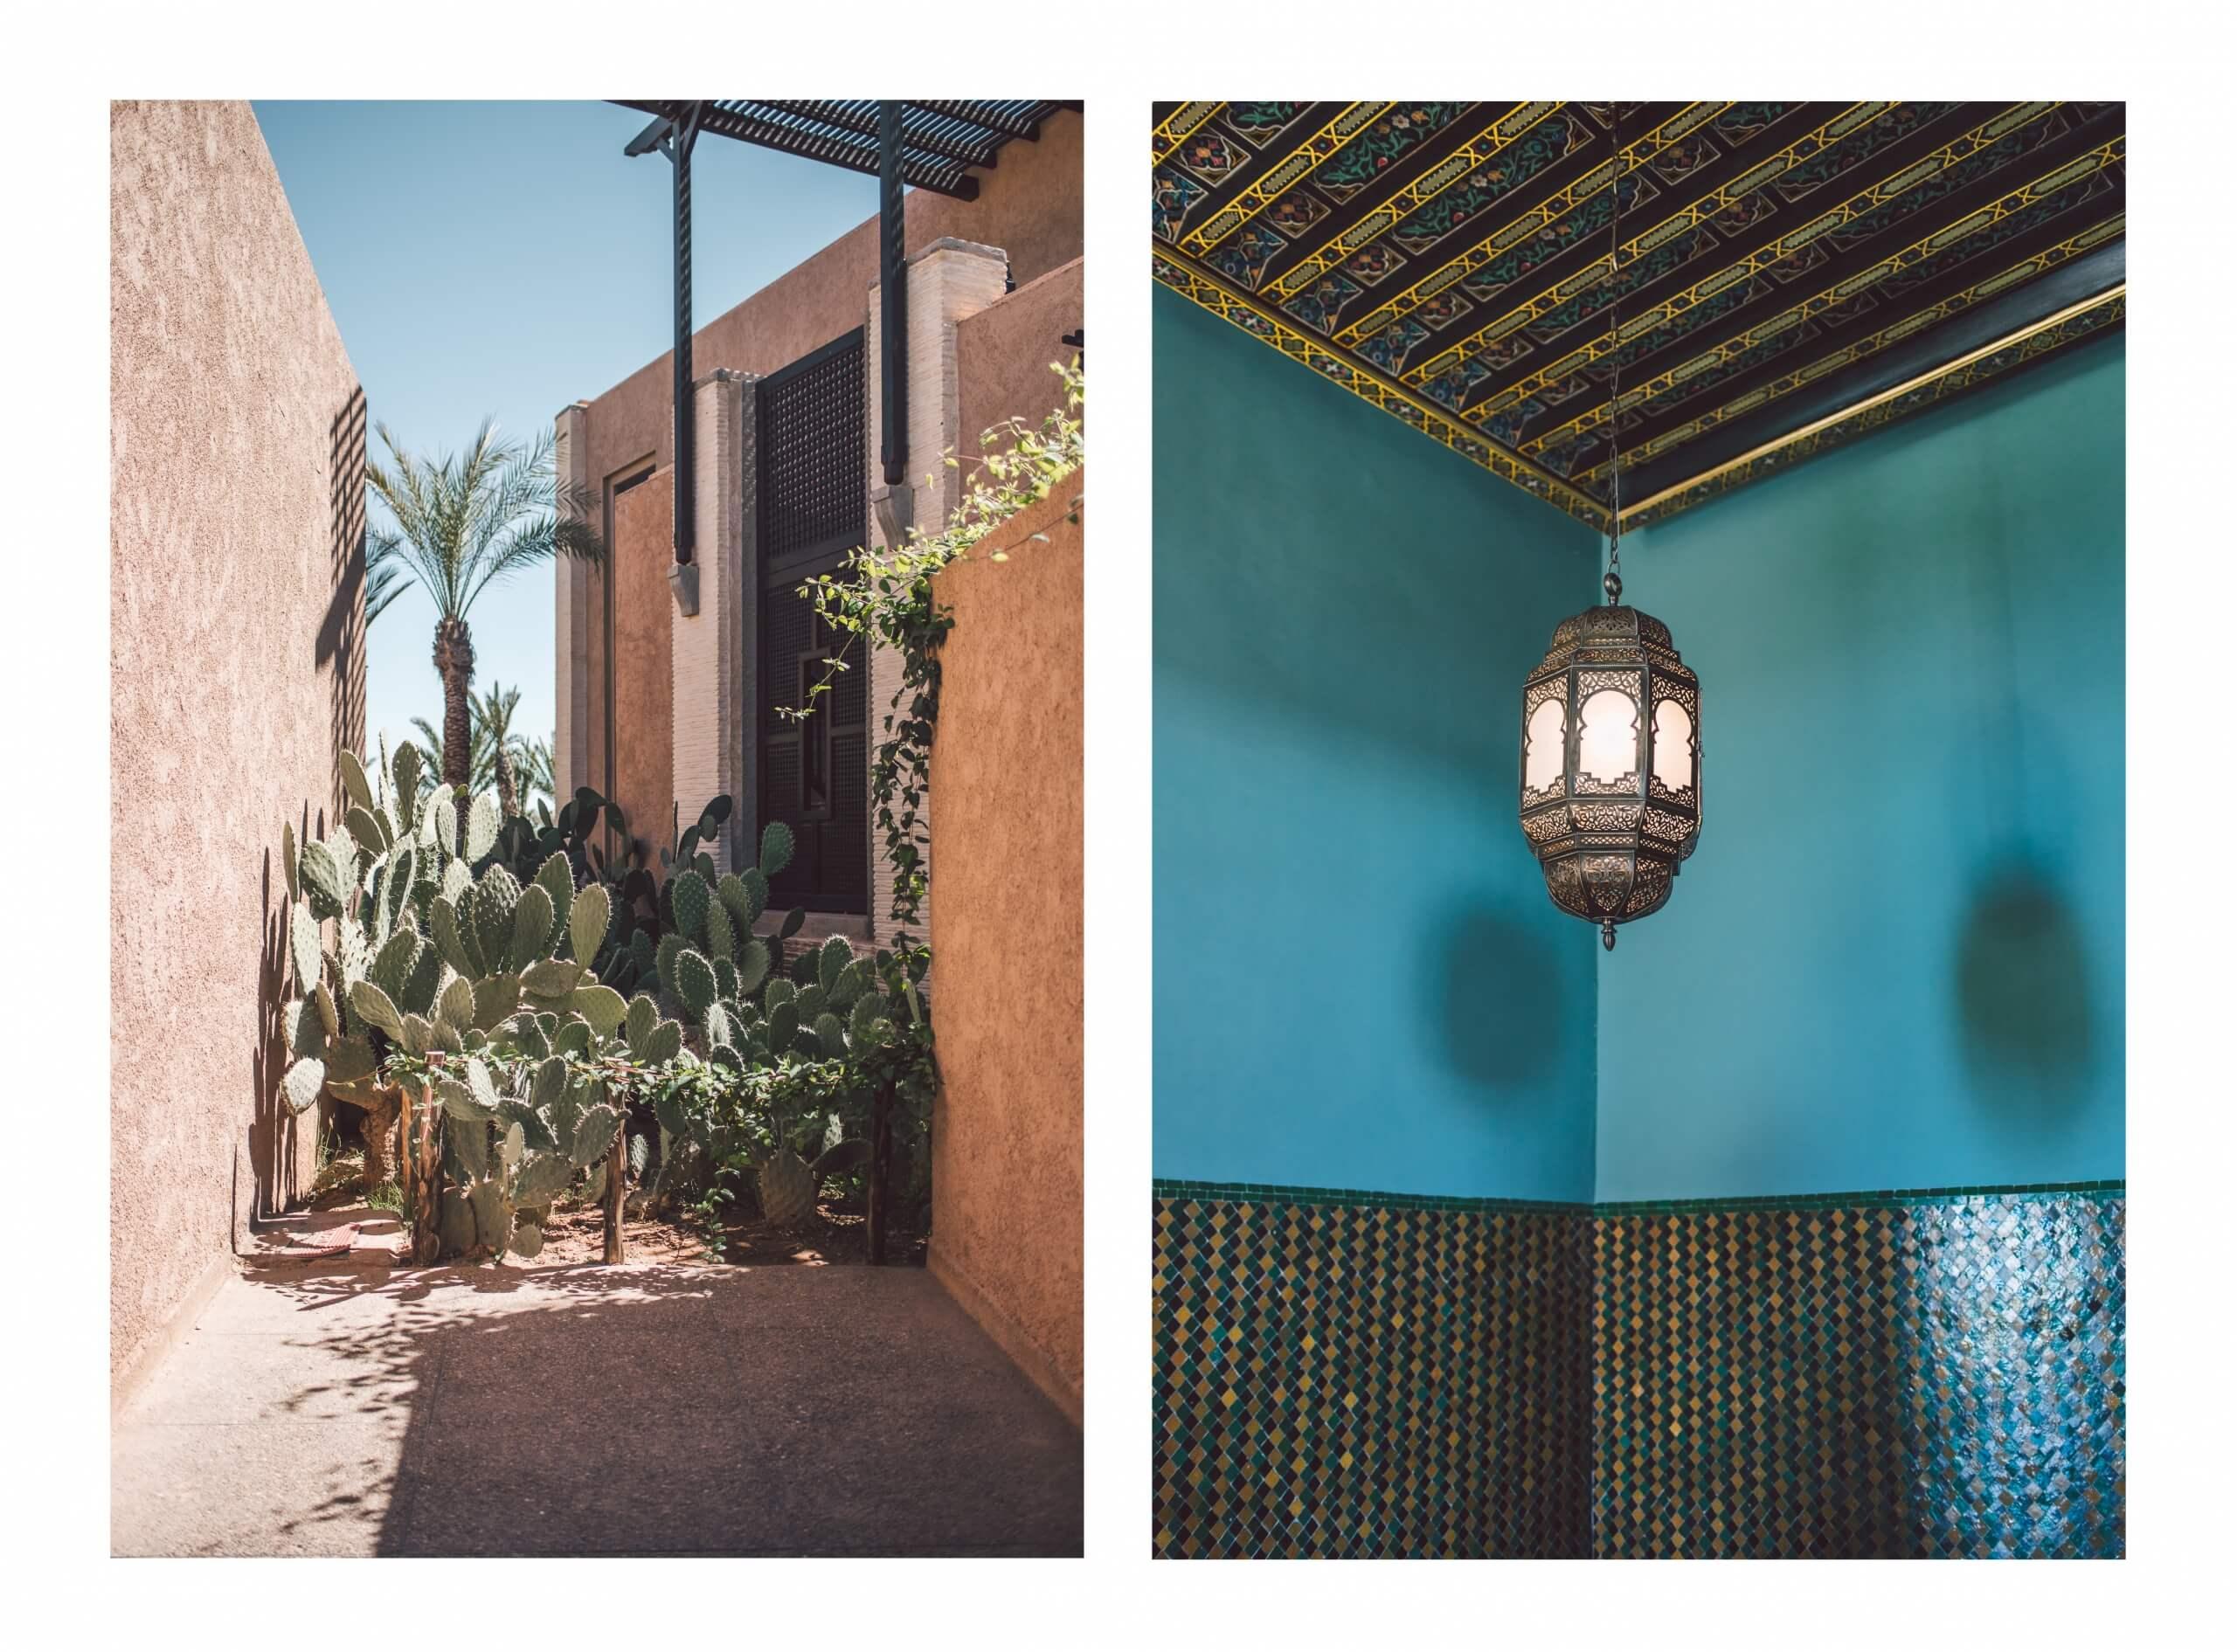 janni-deler-royal-palm-marrakechDSC_9715 copy